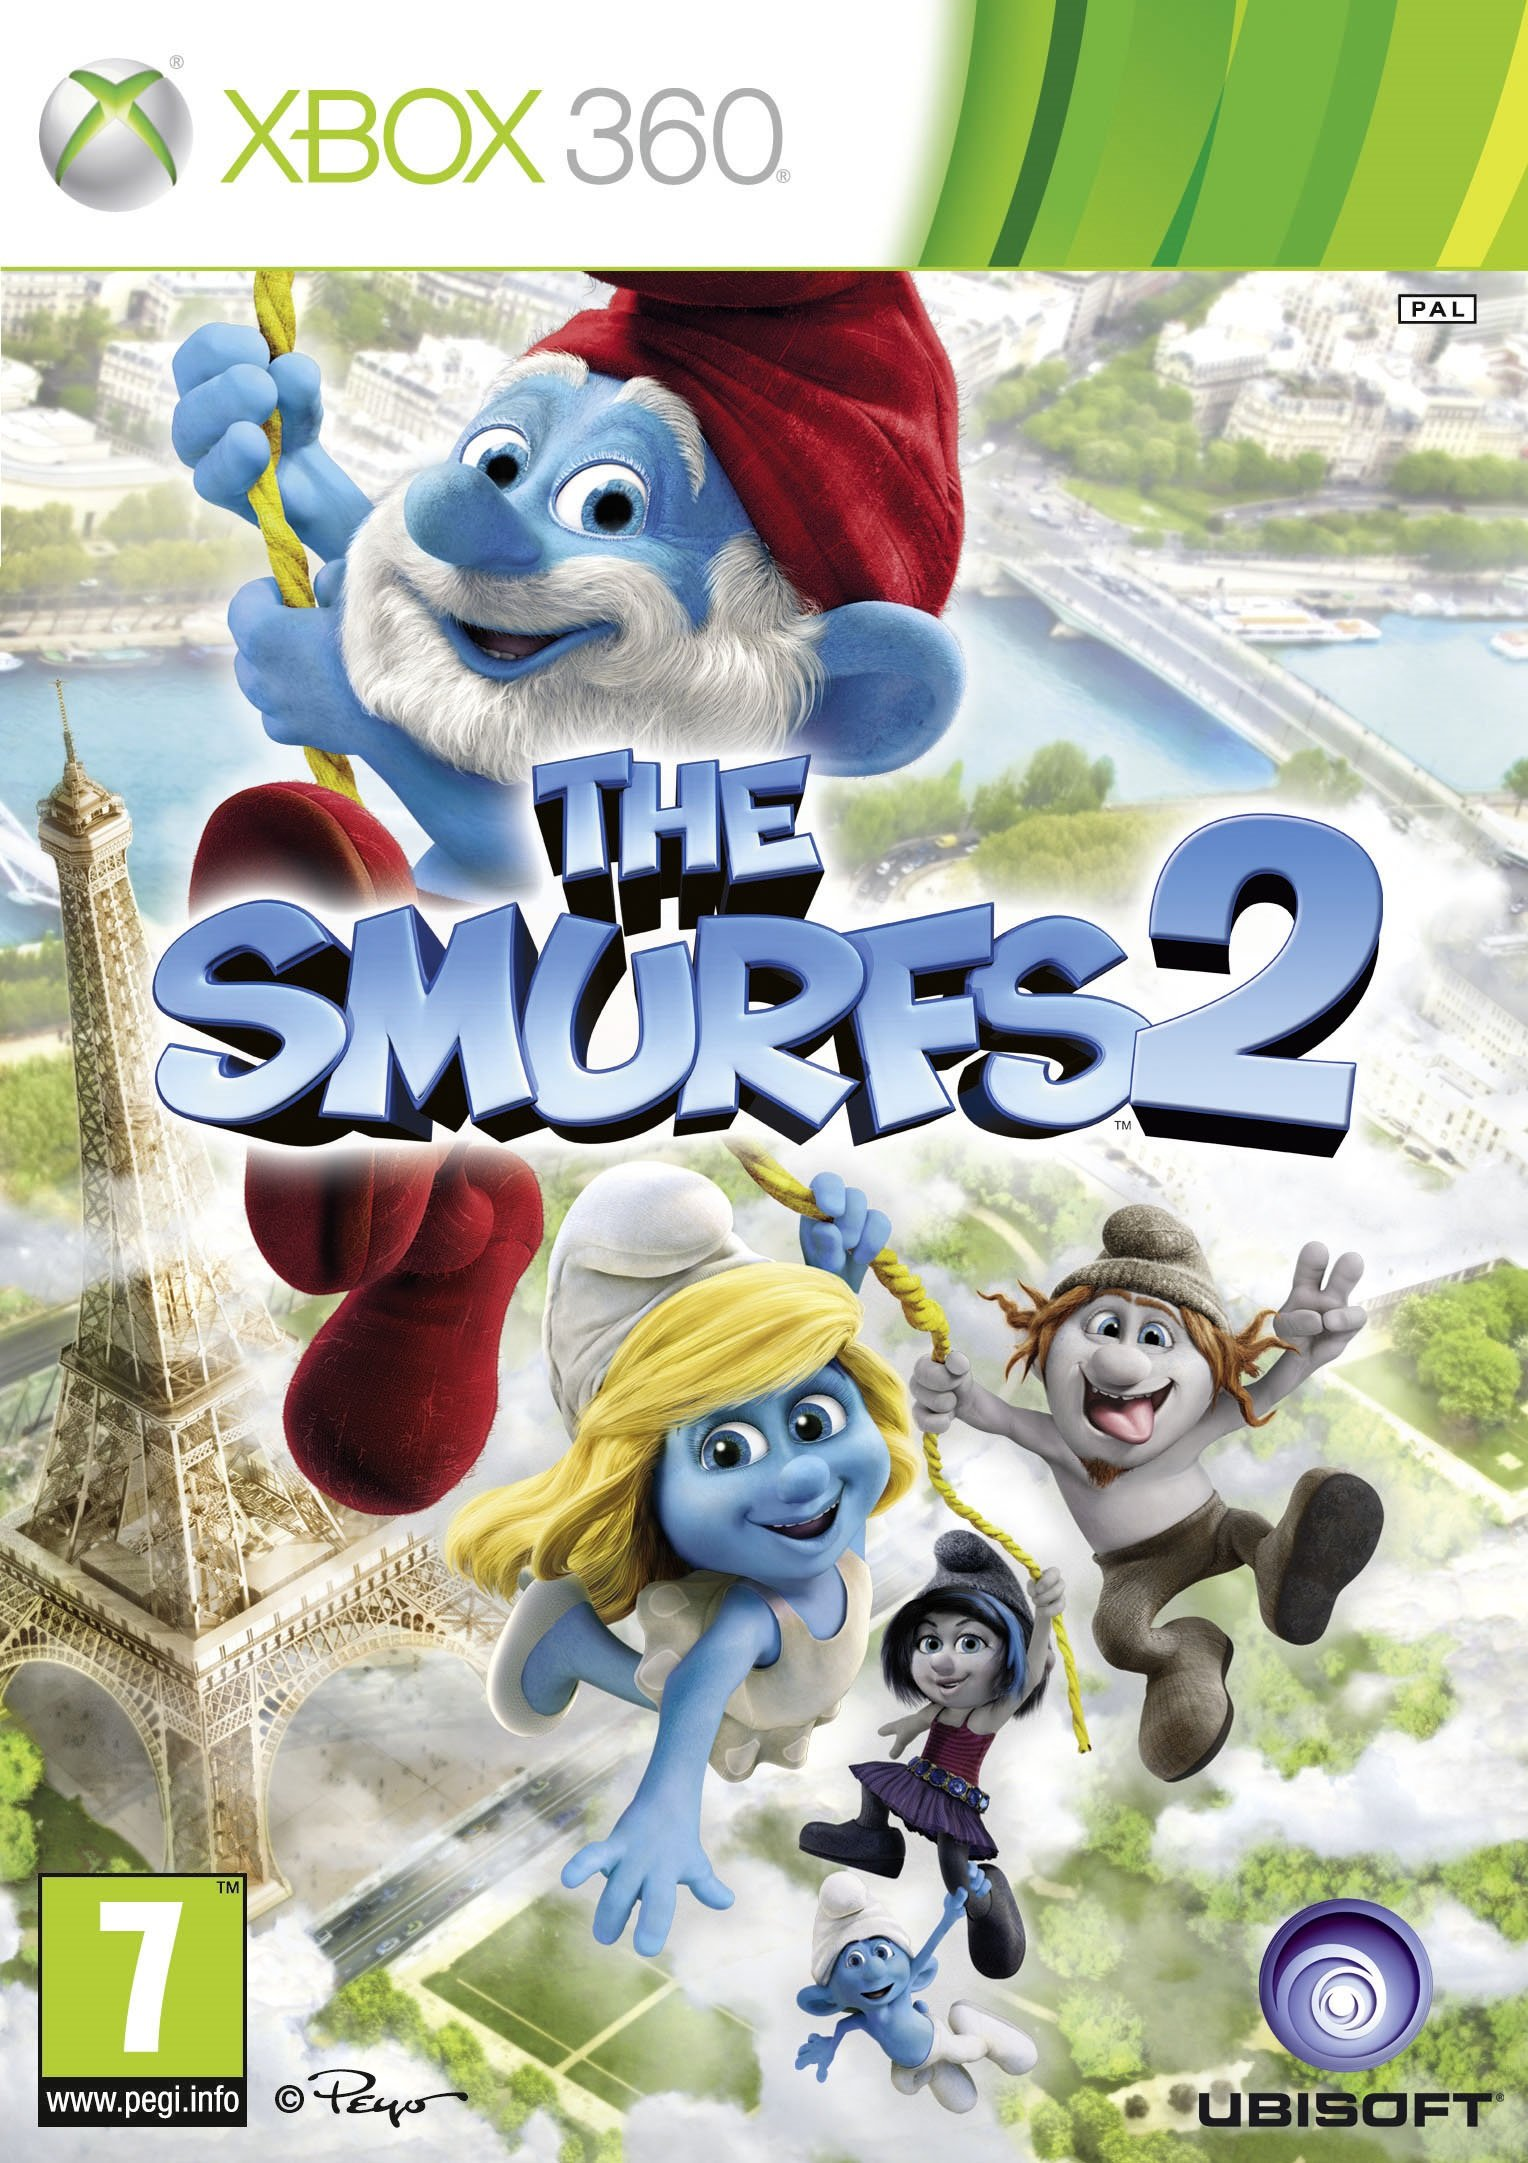 The Smurfs 2 Video Game 2013 Imdb